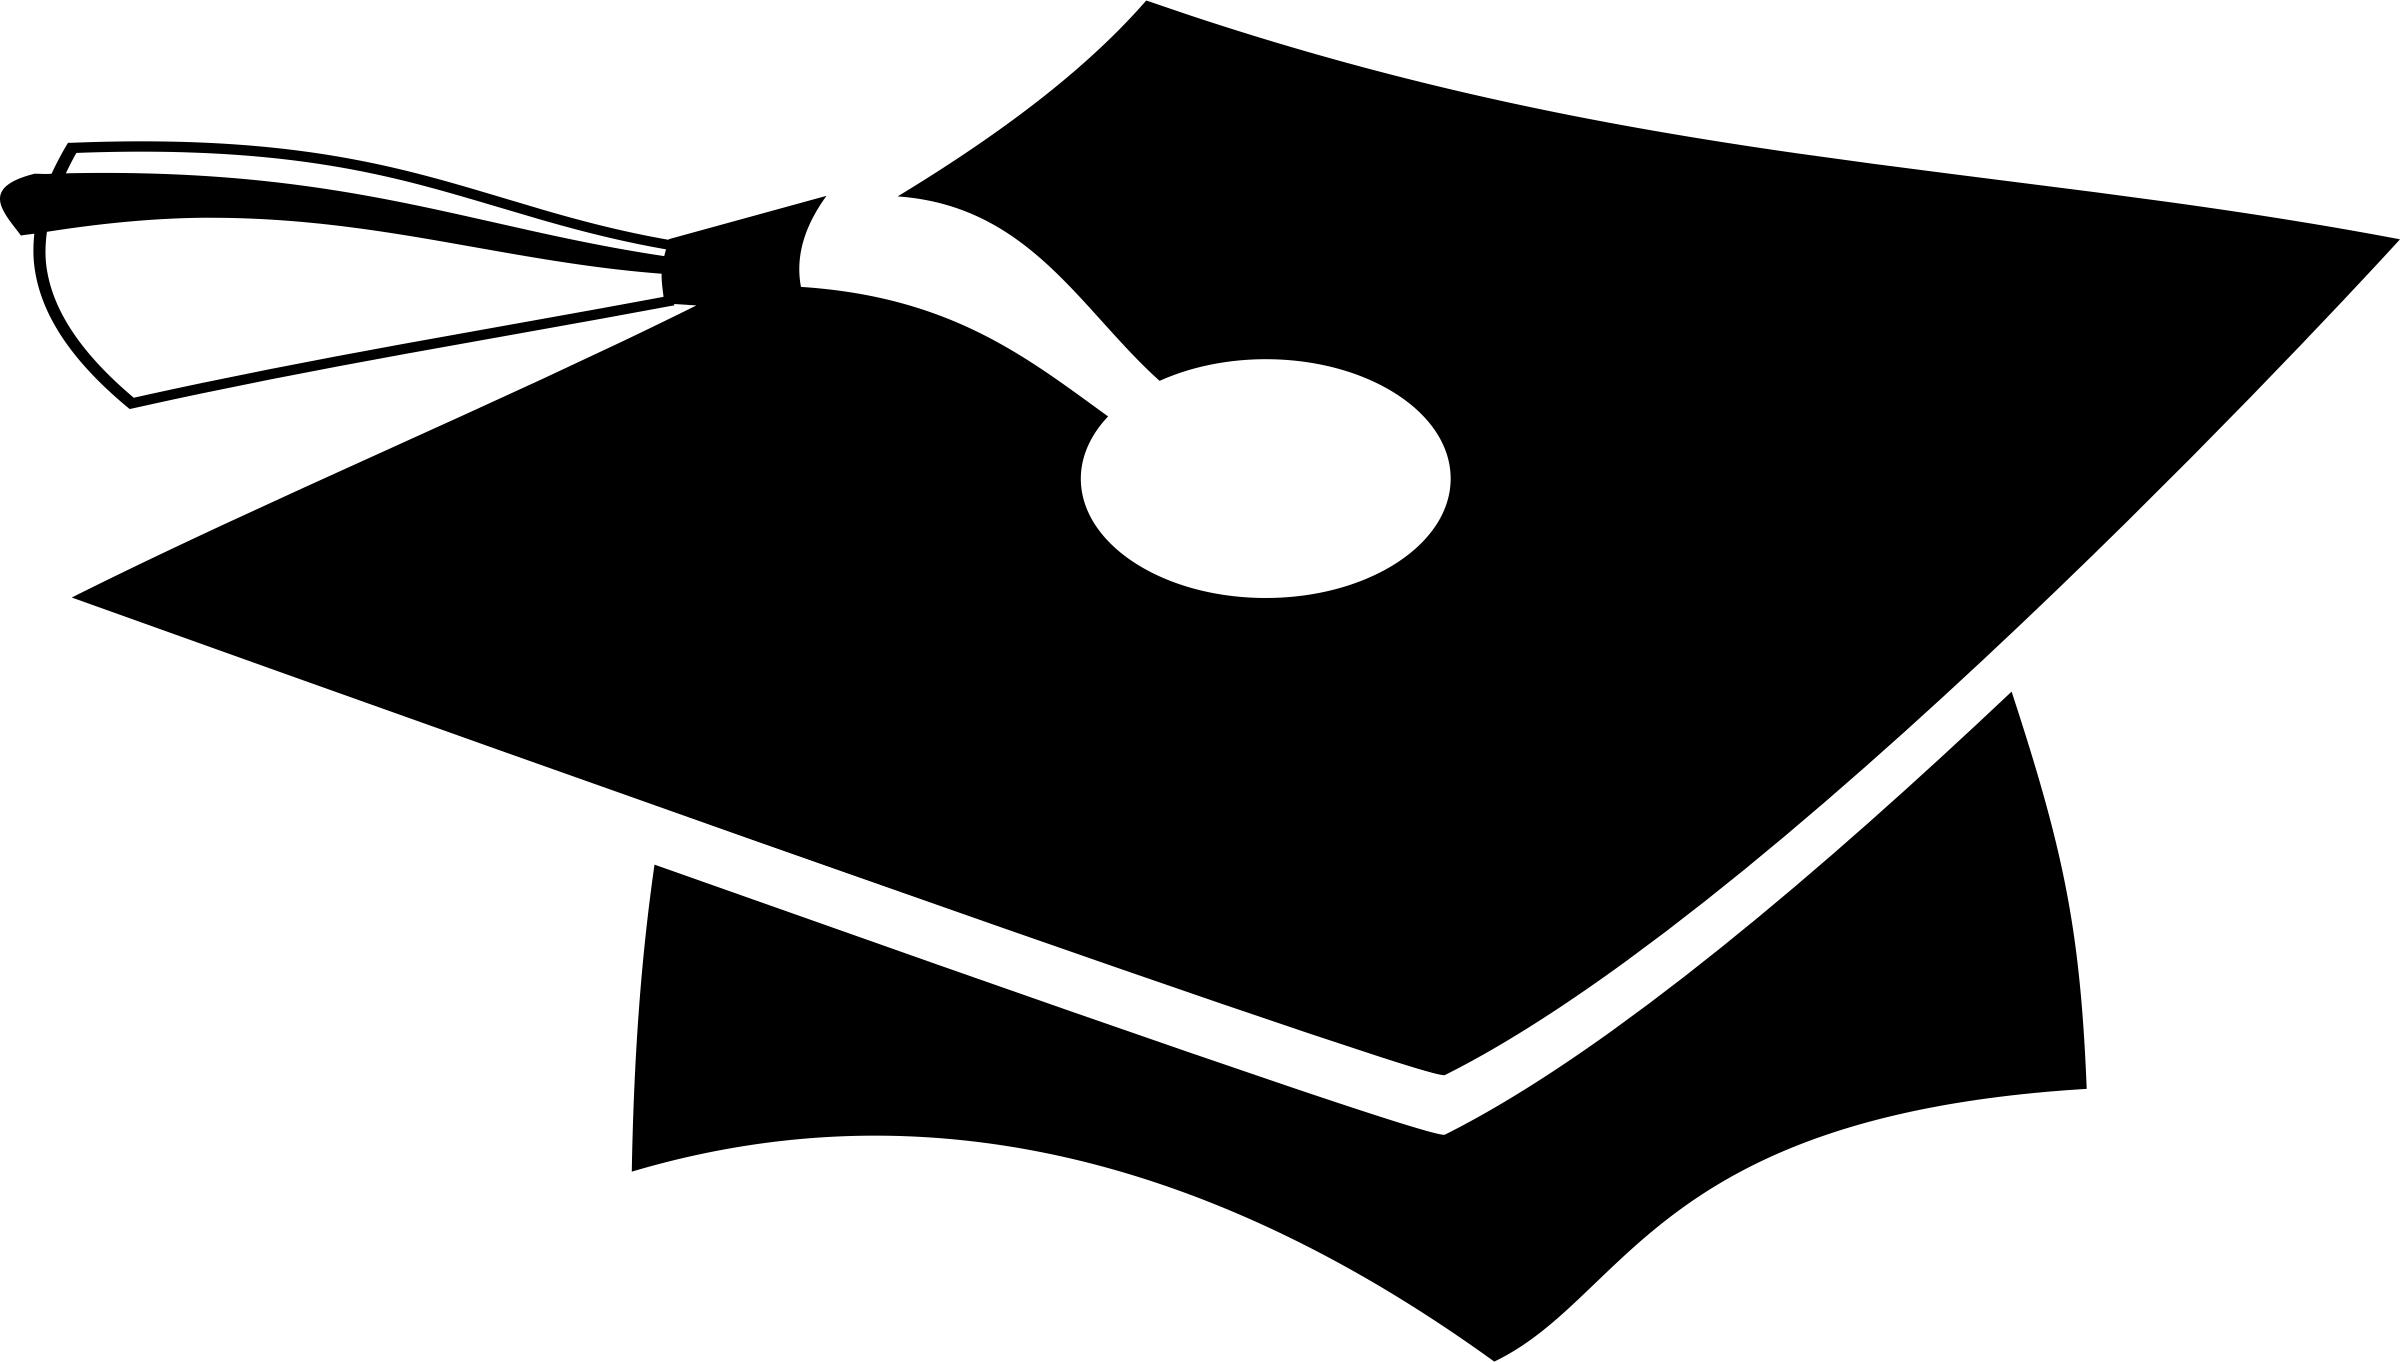 Graduation Hat Image.